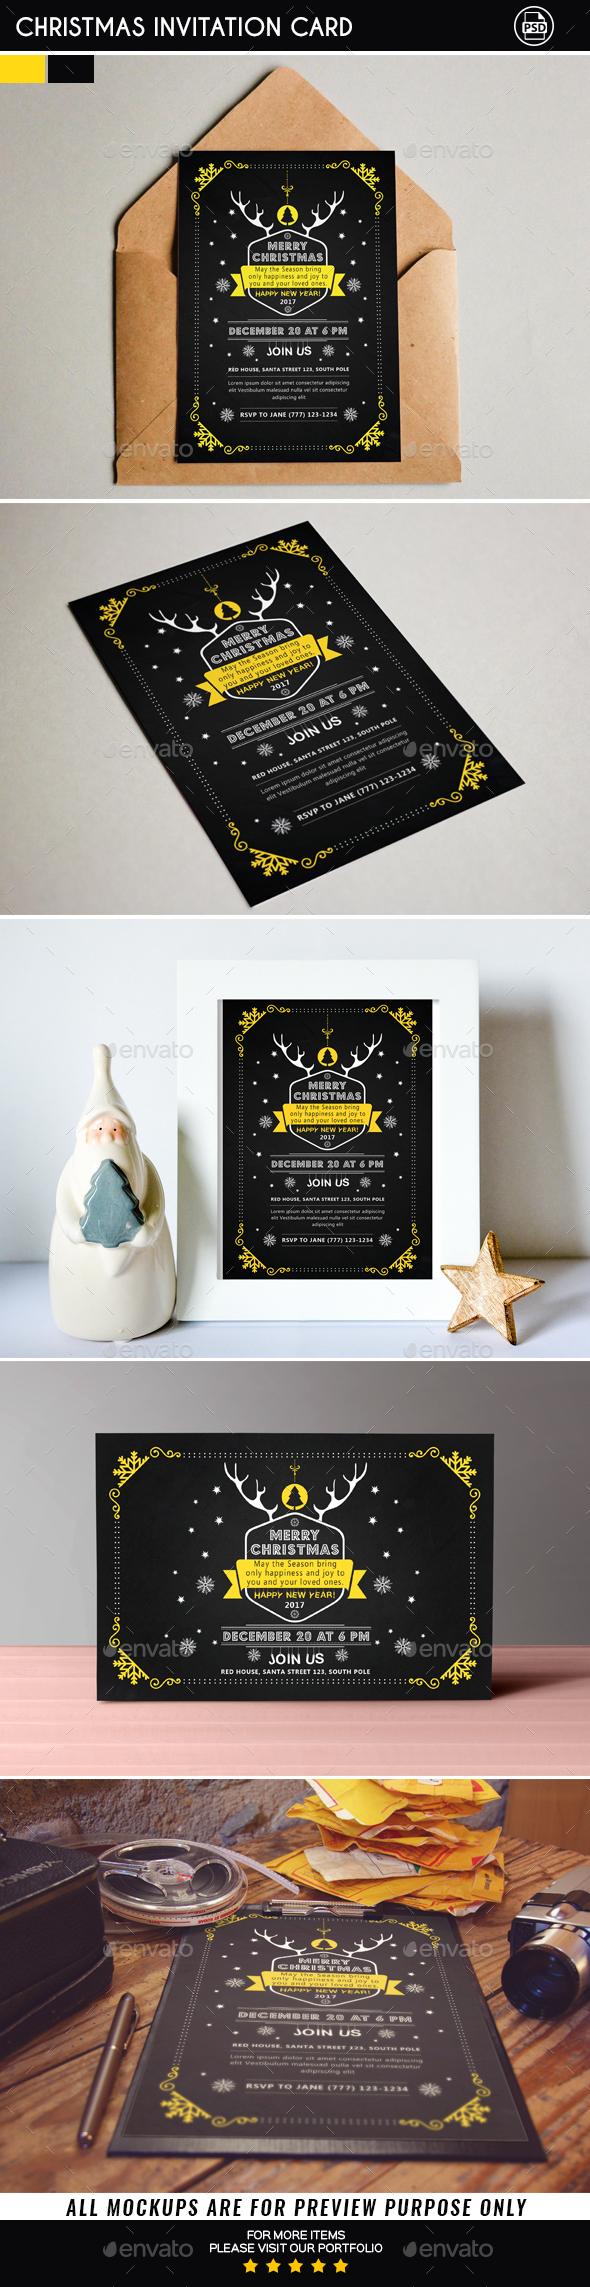 Christmas Invitation Card - Christmas Greeting Cards